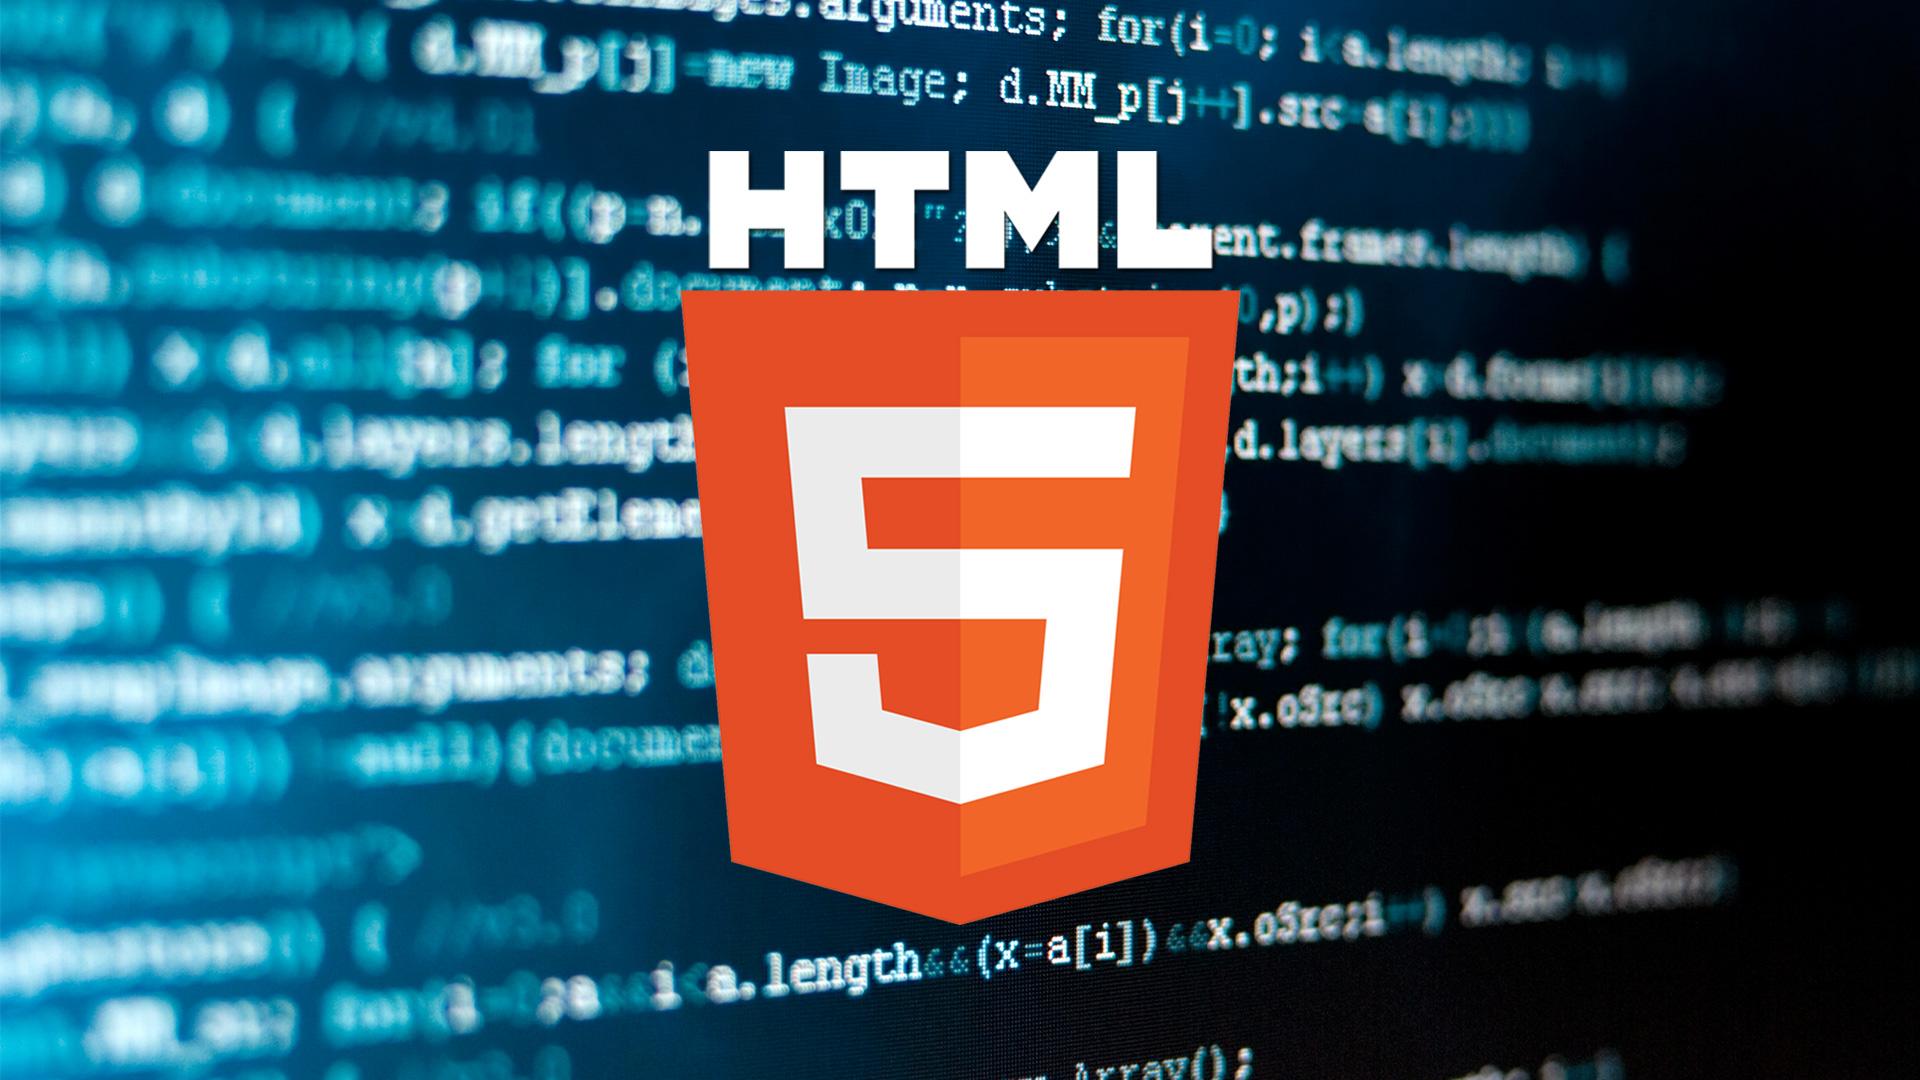 11 принципа за поддържане на чист HTML код. Безплатни ИТ курсове